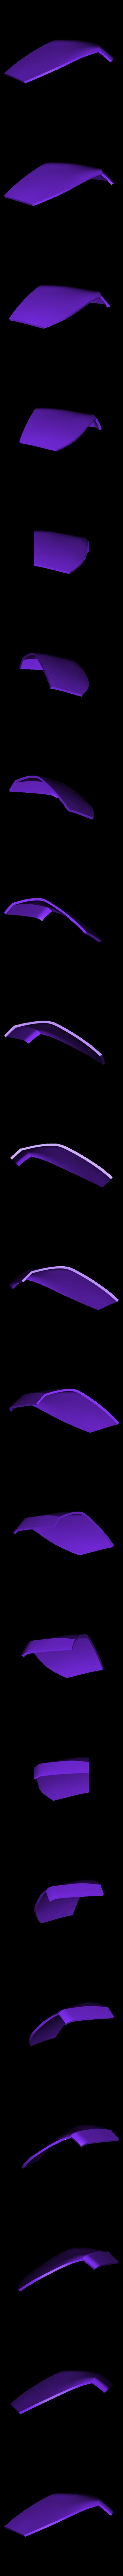 Part_4.stl Download free STL file Red Hood Helmet (Batman) • 3D printer object, VillainousPropShop